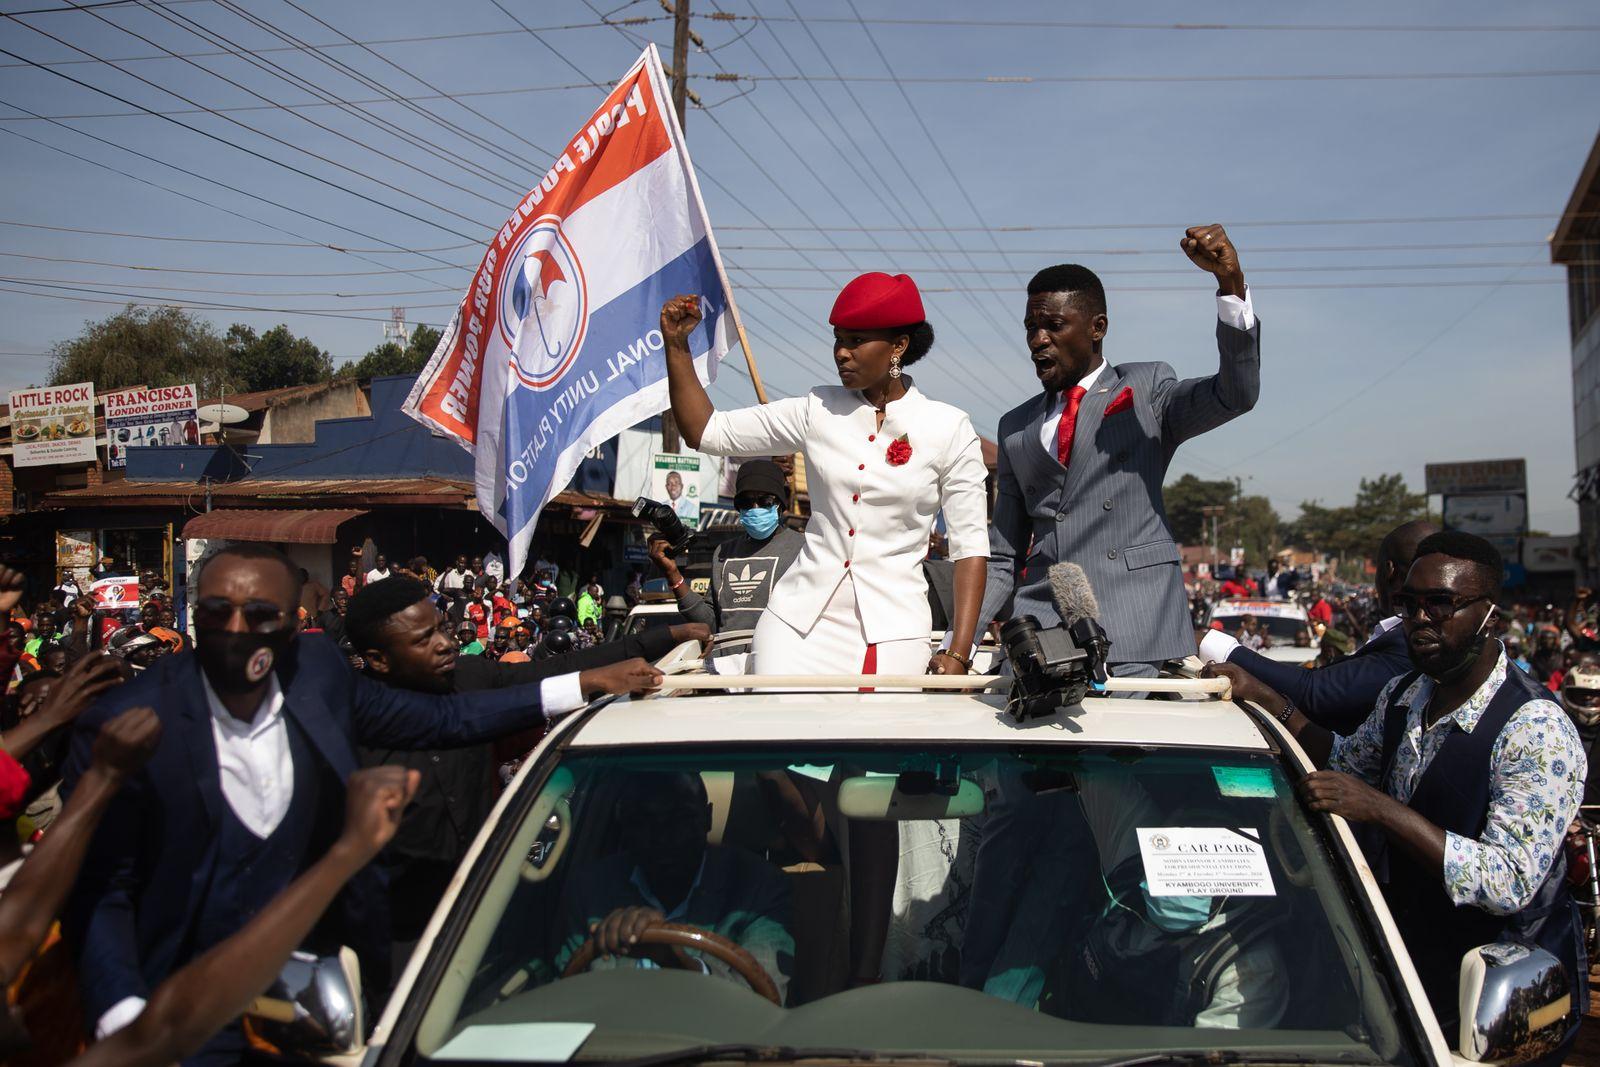 *** BESTPIX *** Bobi Wine Is Nominated For Uganda's Presidential Election